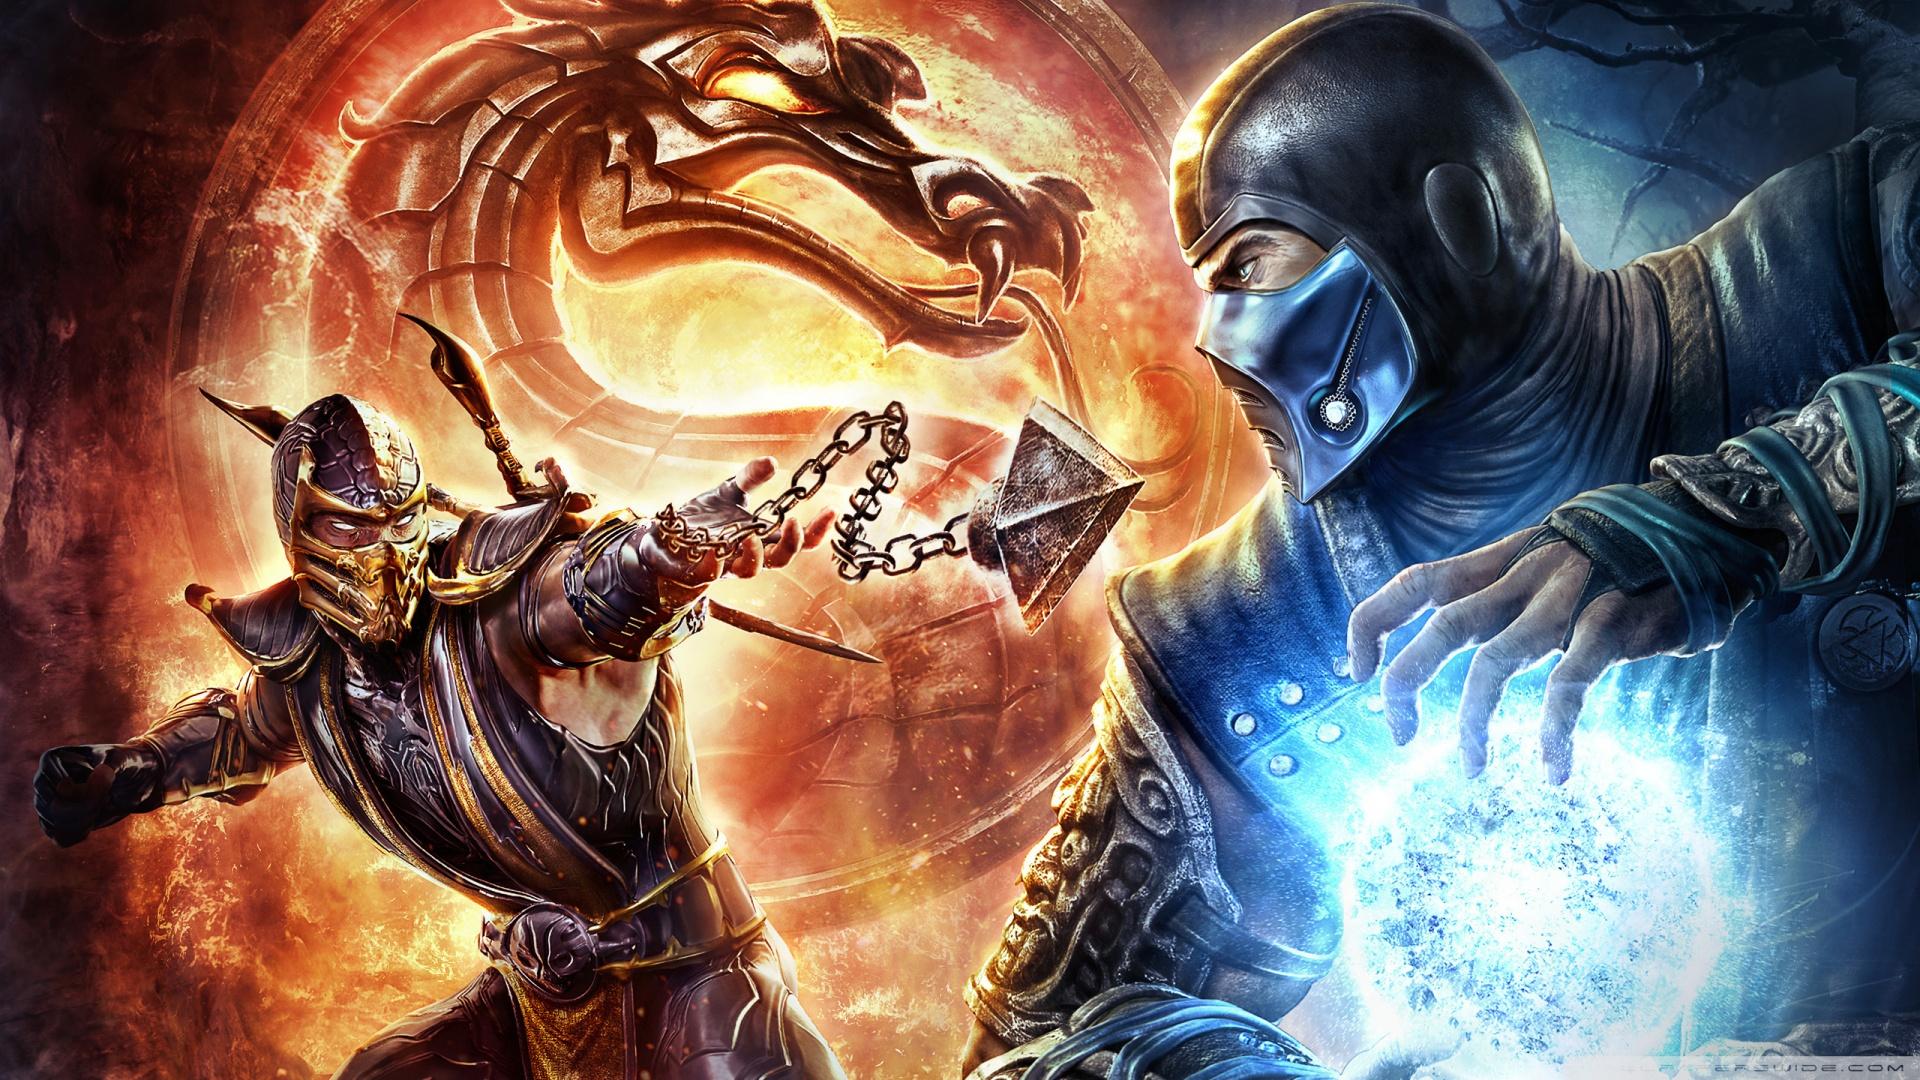 Mortal Kombat - a better story than Smash Bros.?